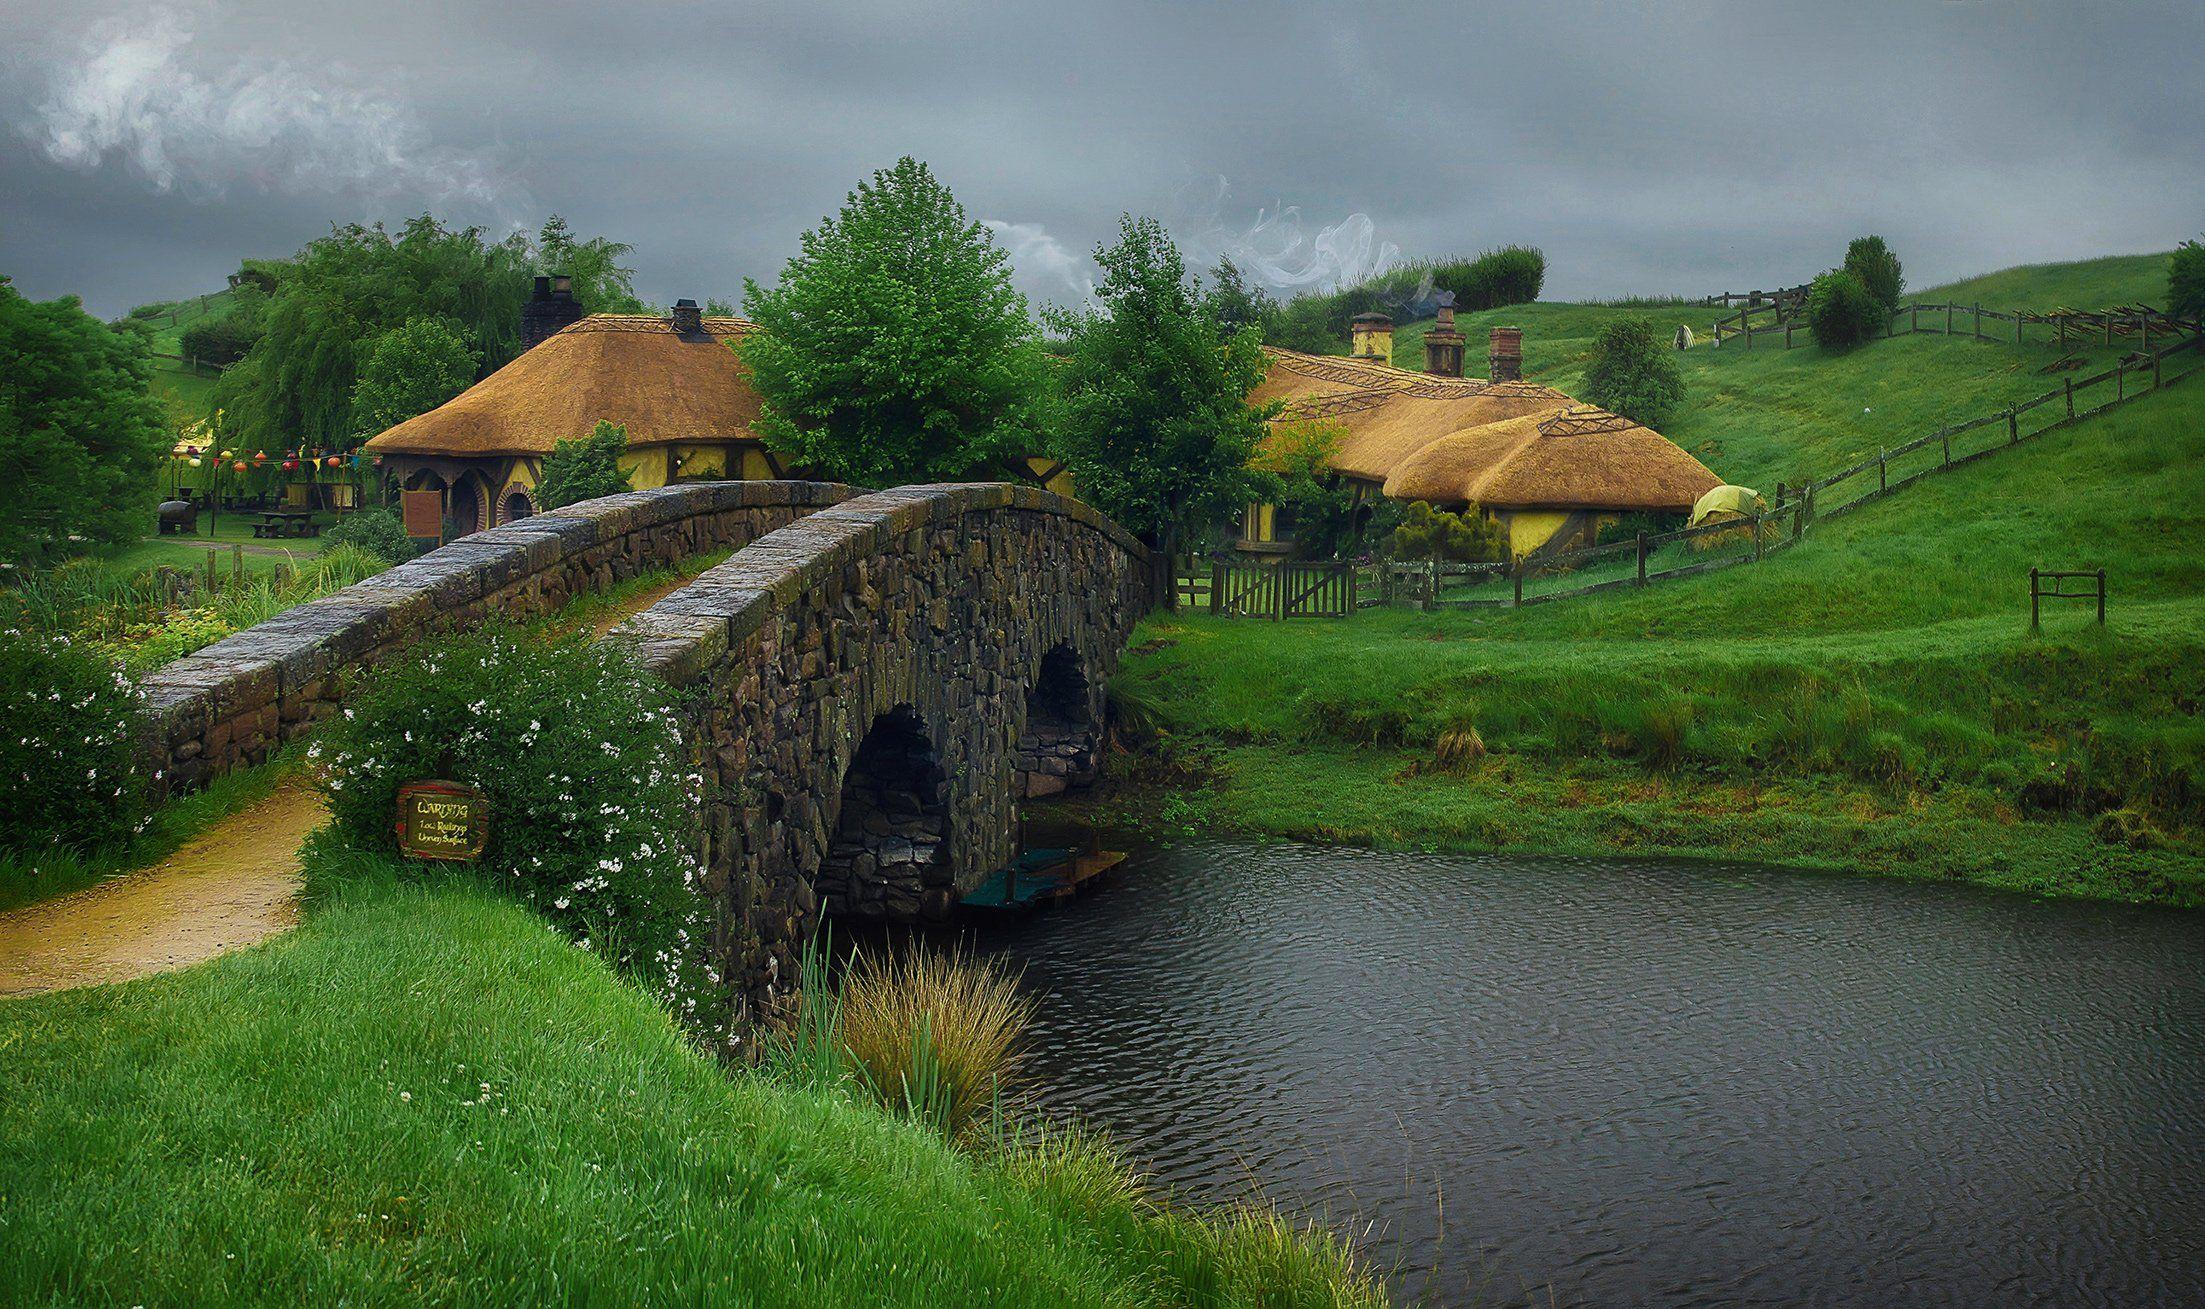 Новая Зеландия, хоббитон, деревня, мост, Алексей Ермаков